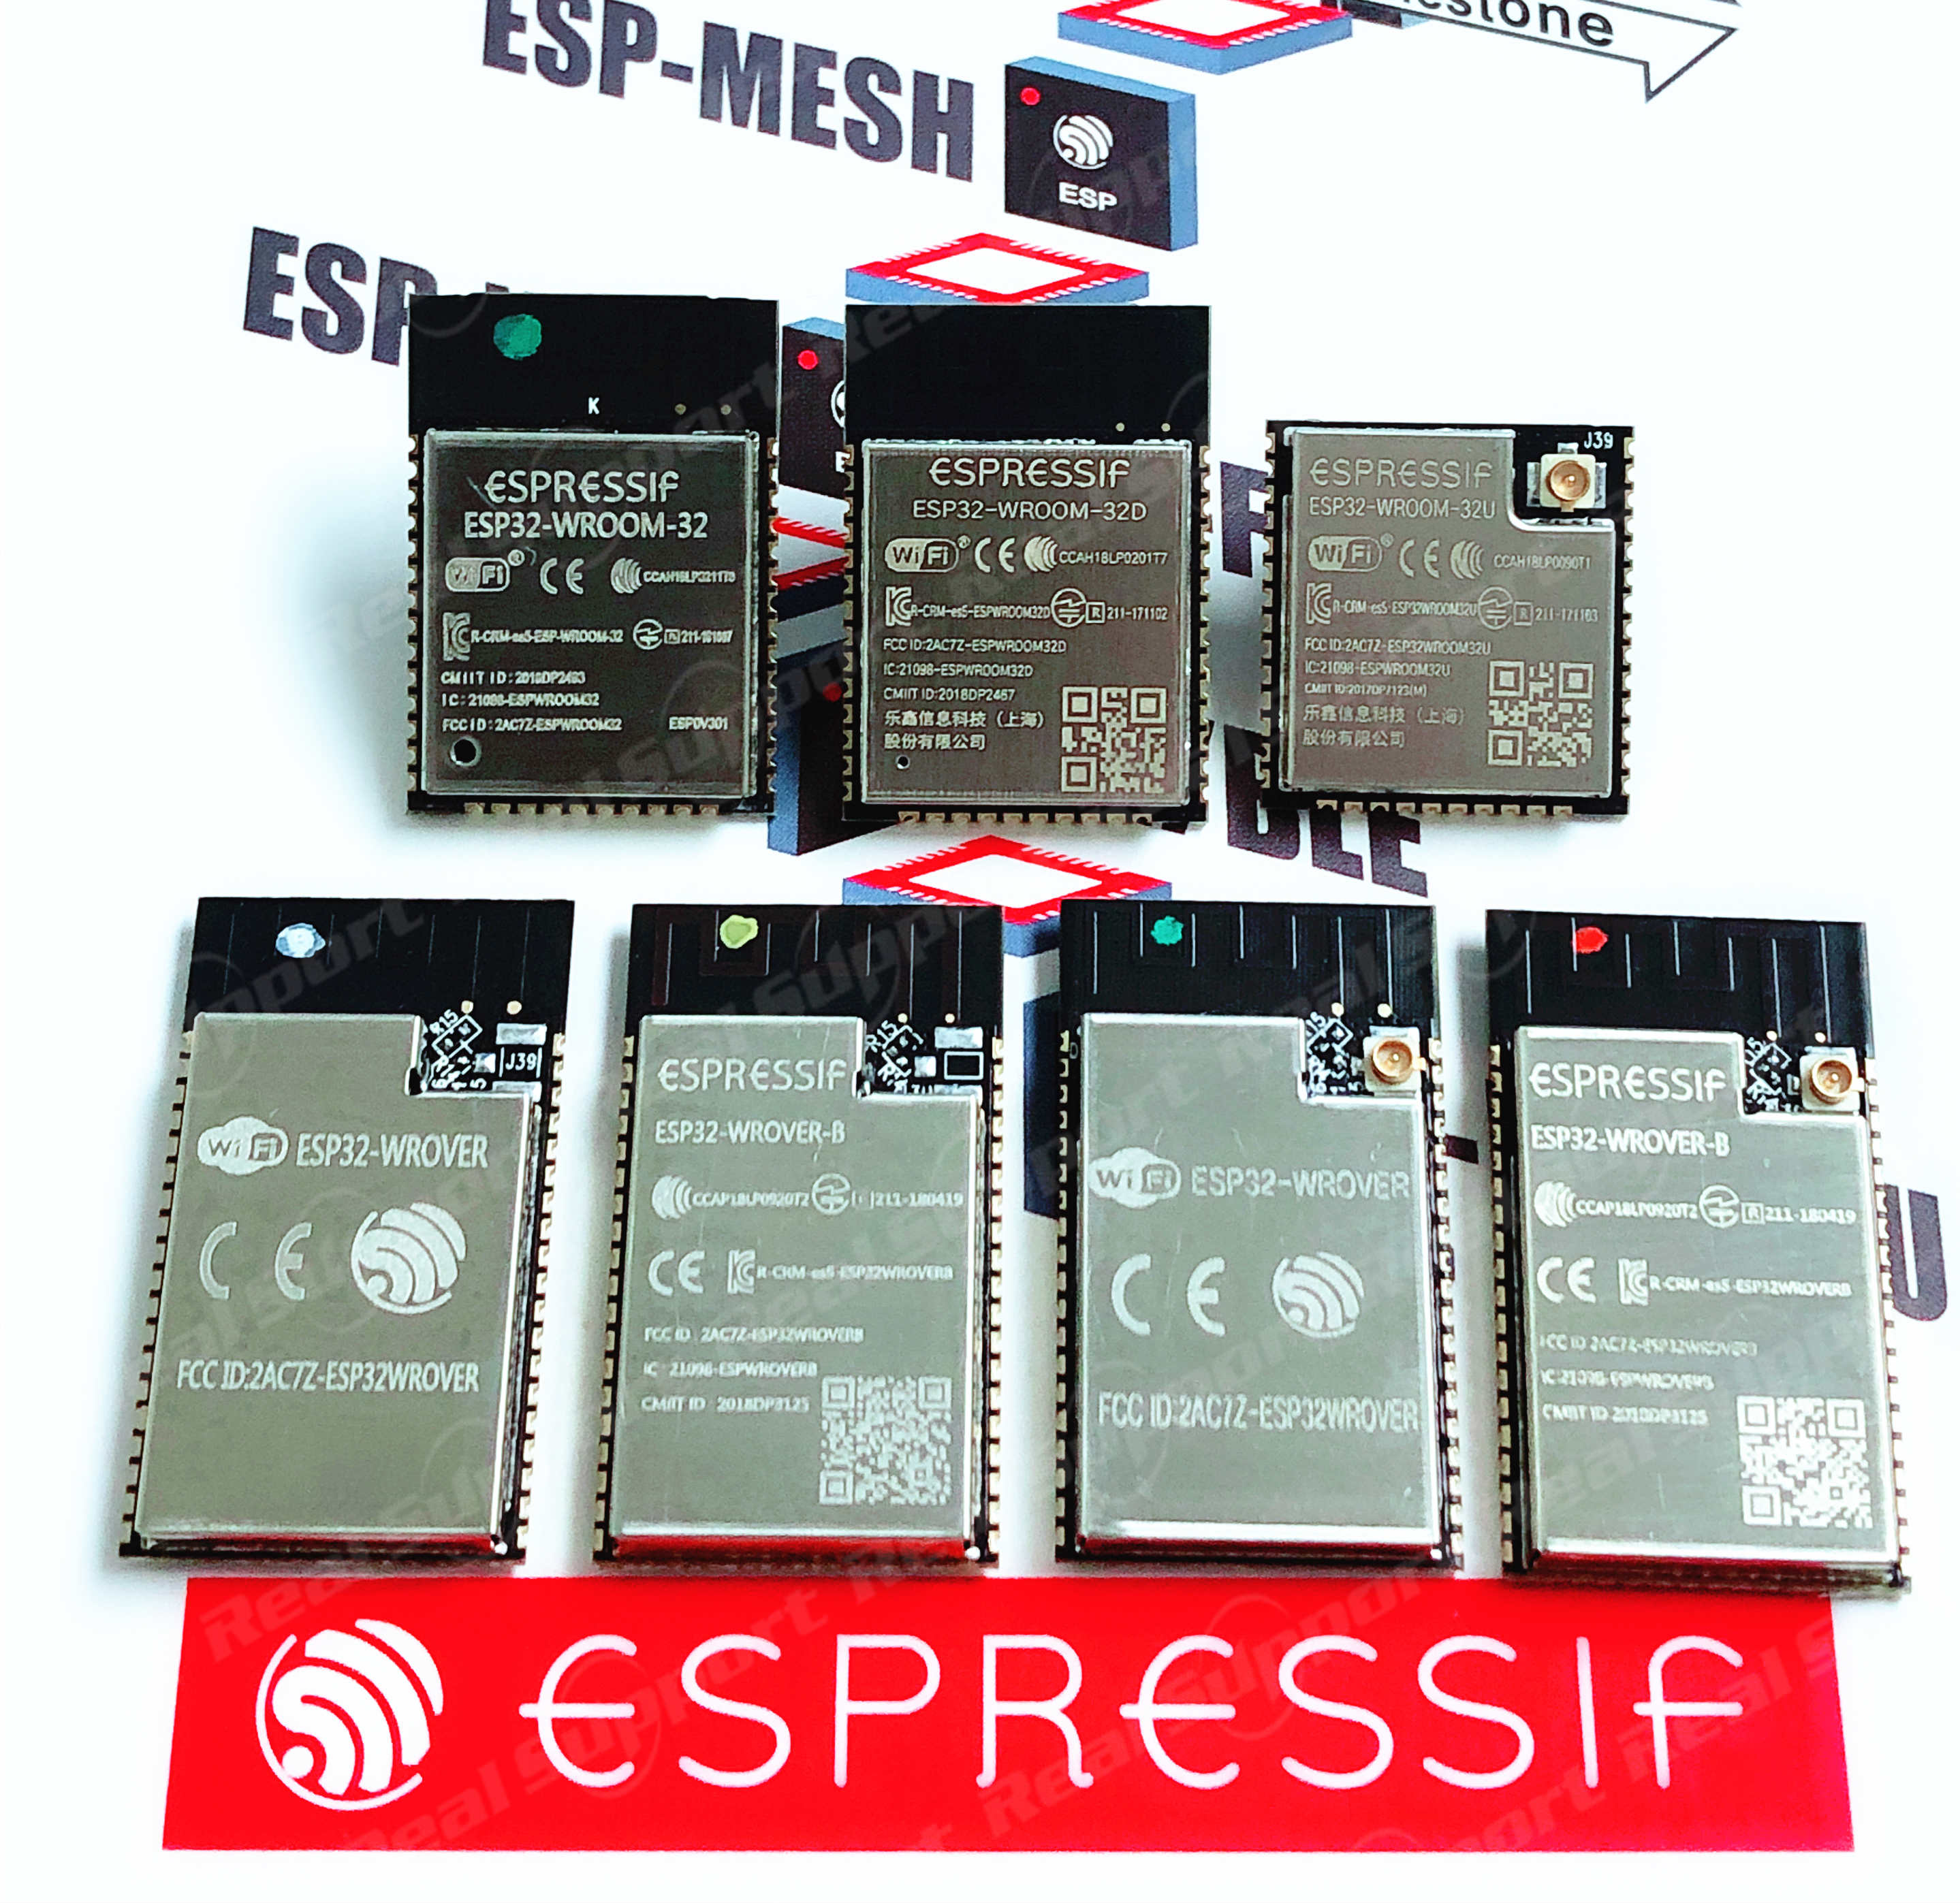 ESP32 ESP-32 Module ESP32-WROOM ESP32-WROVER Series Module ESP32-WROOM-32D-32U ESP32-WROVER-I -IB -B Espressif Original